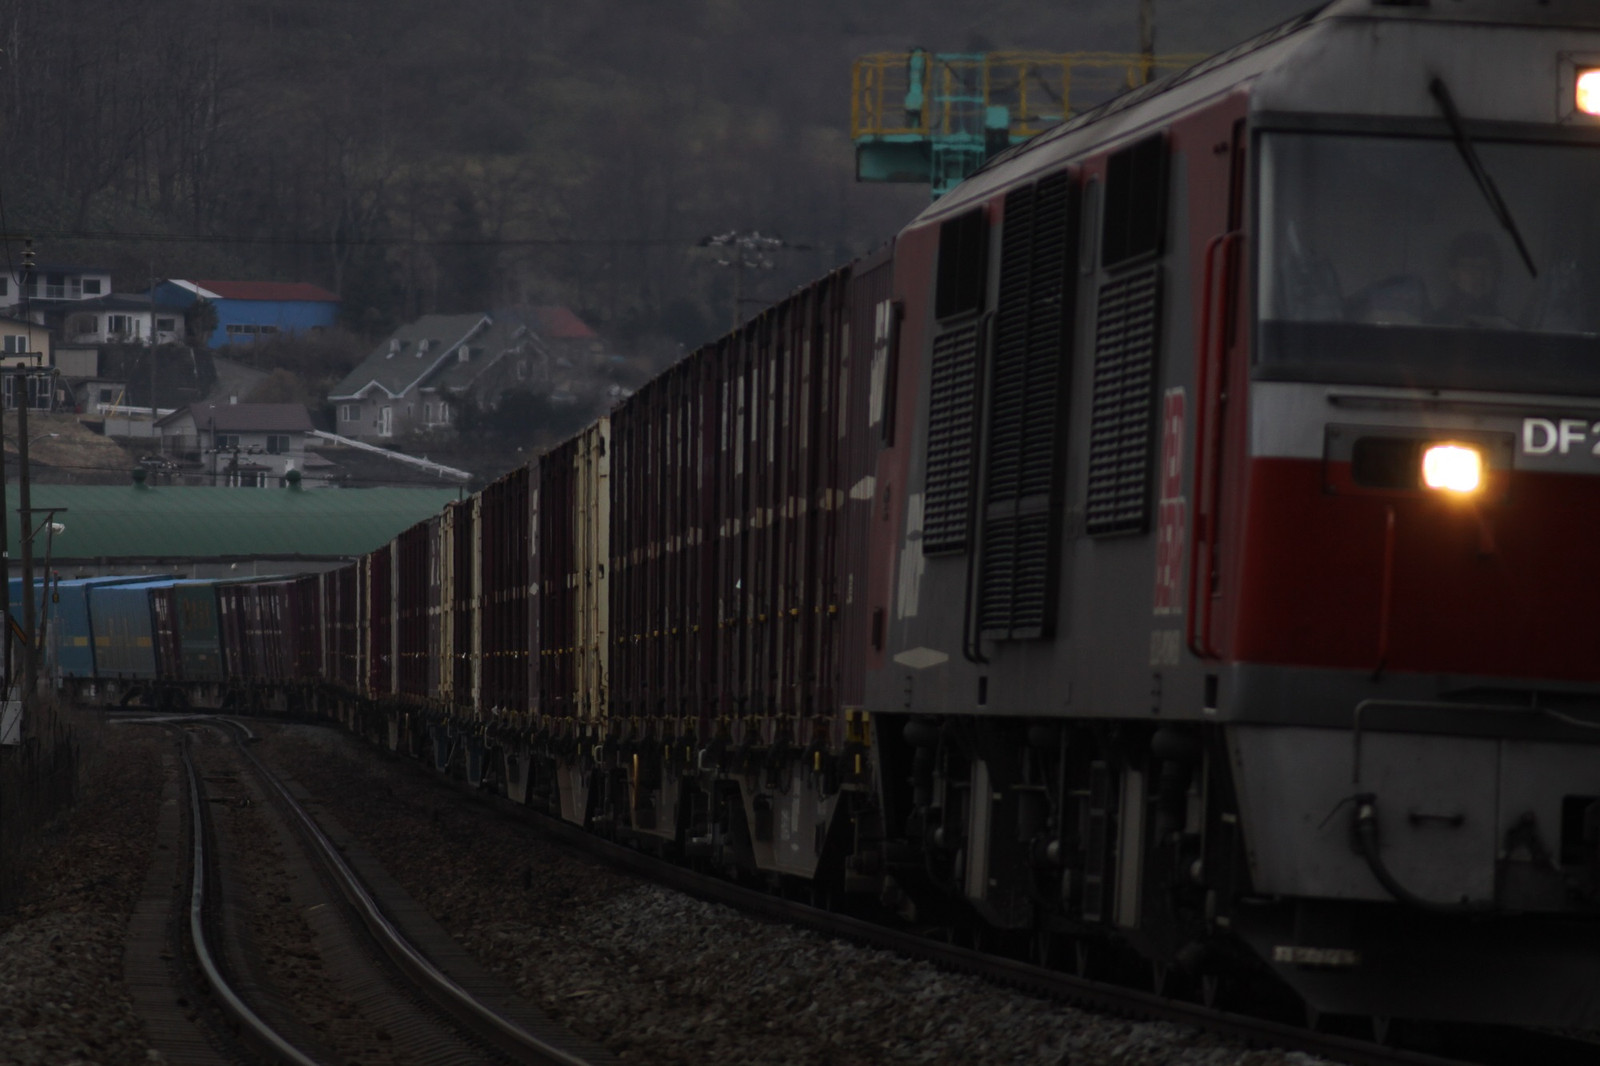 Jr16040220003